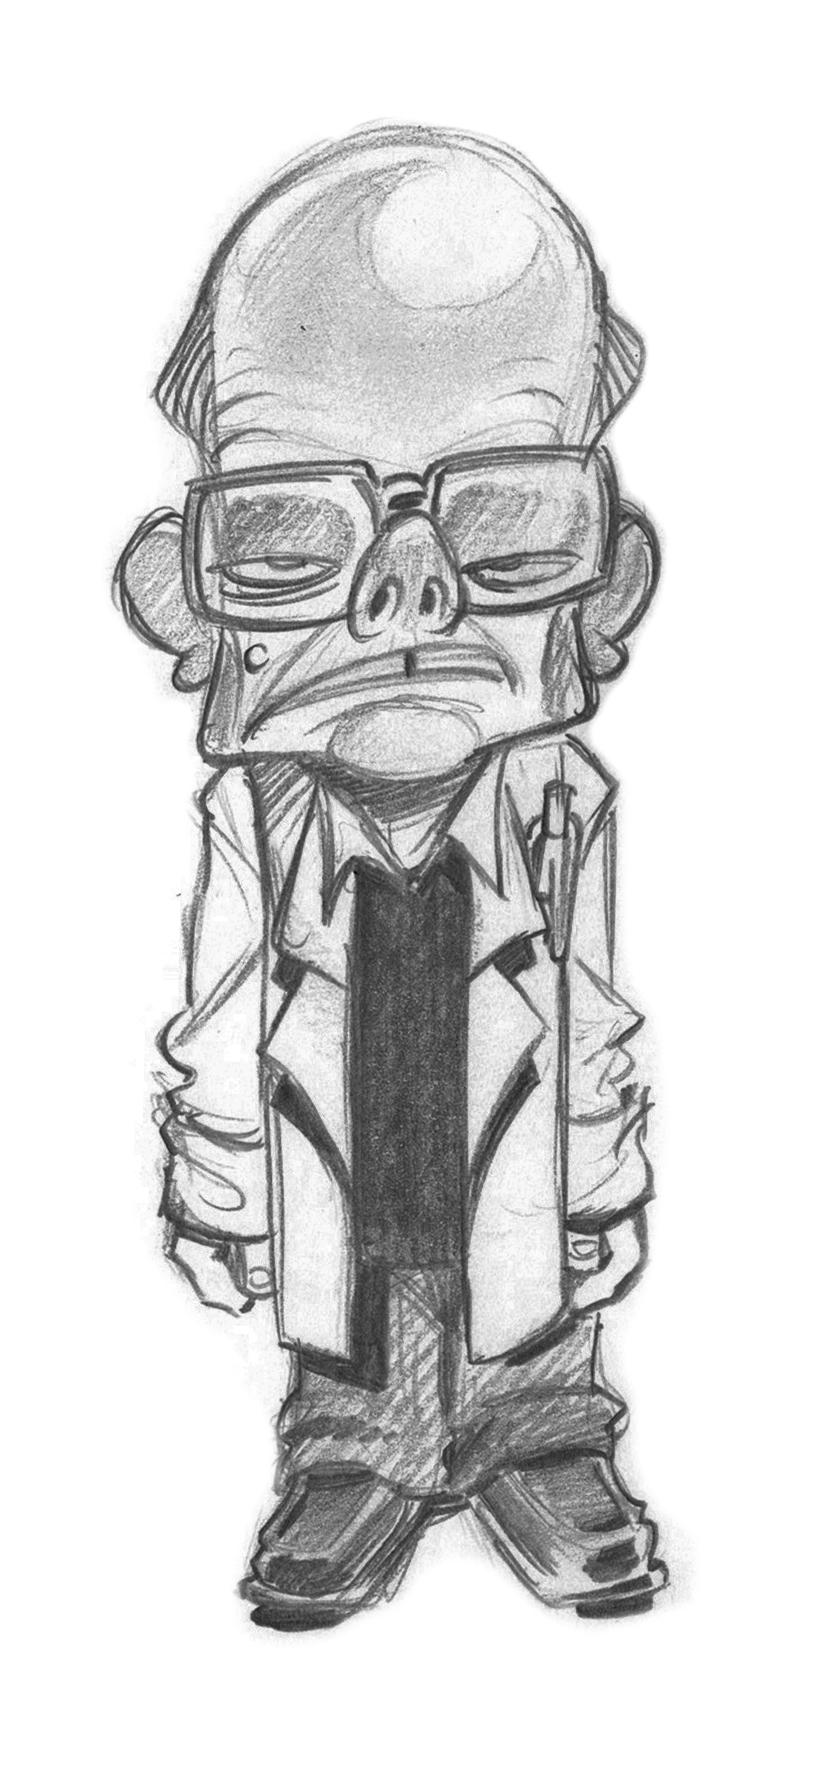 Billingsley First sketch